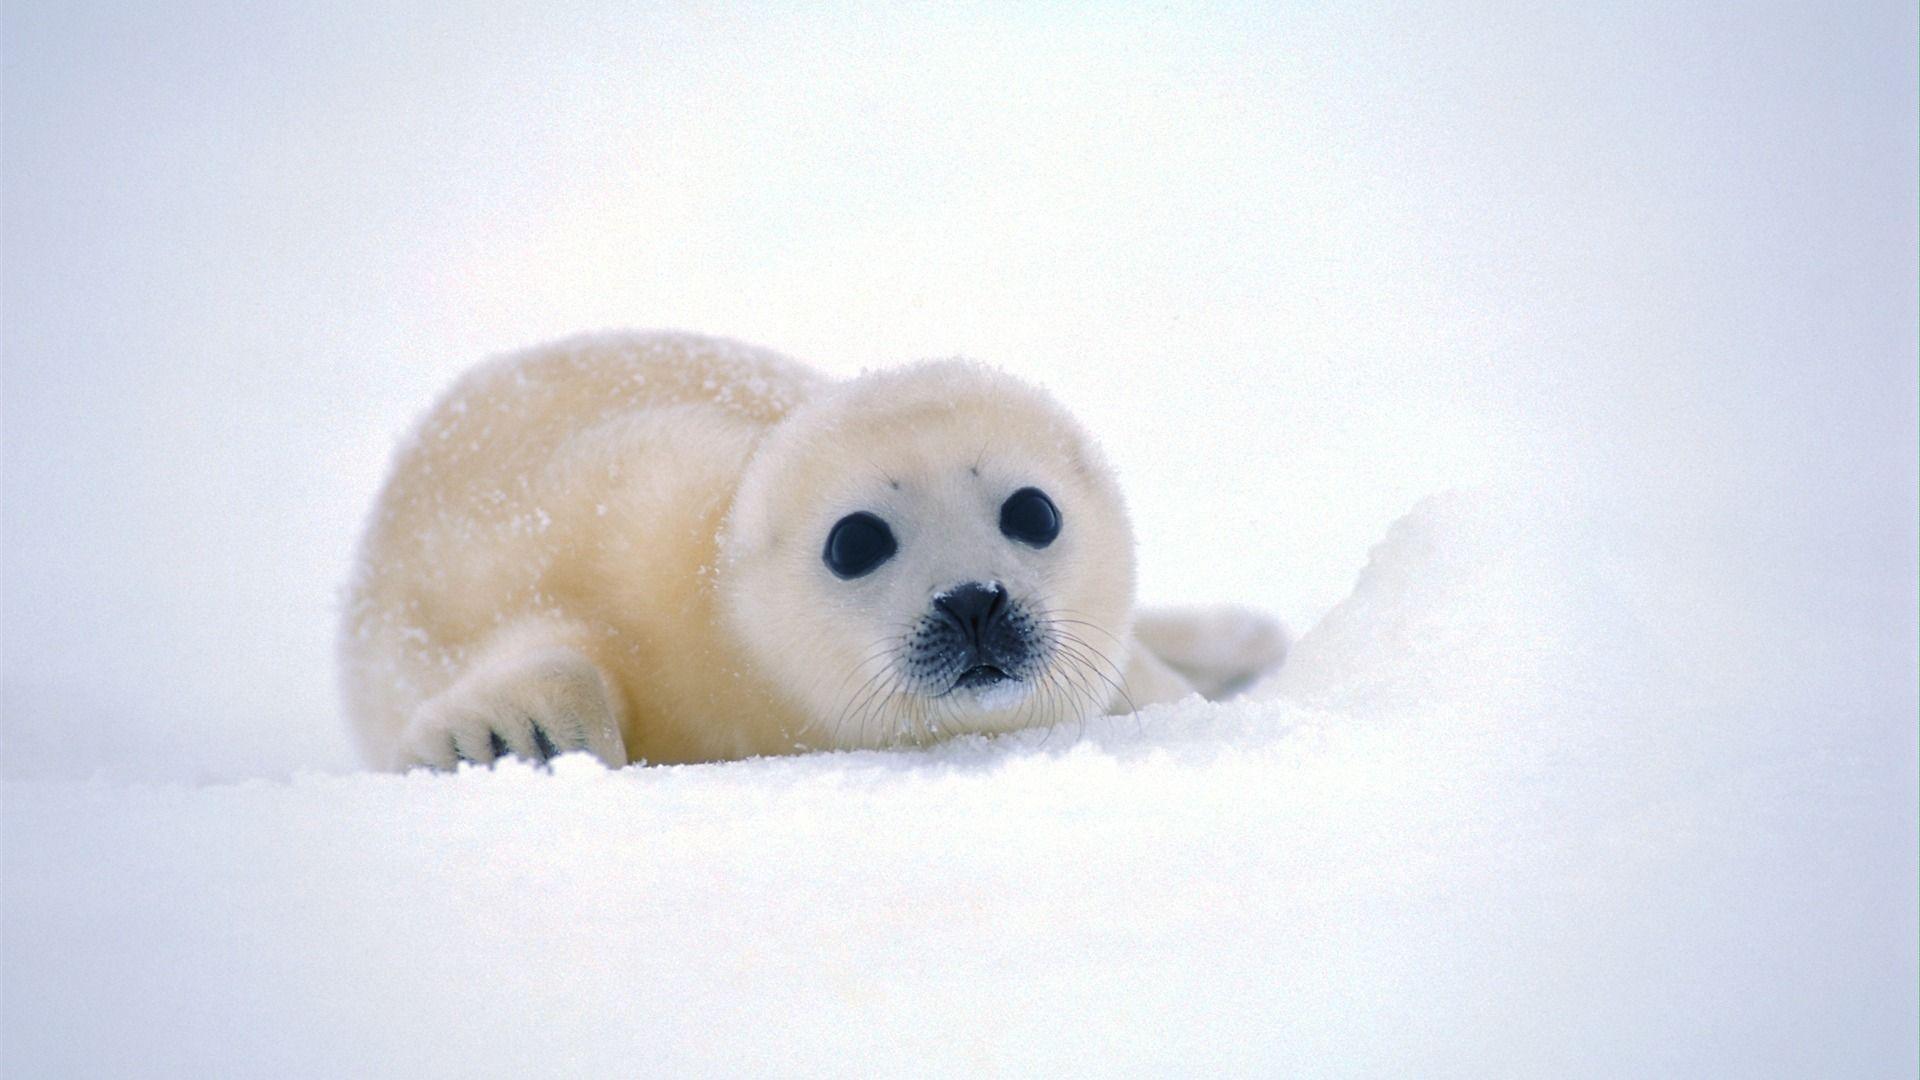 ccfaafbdedced-baby-seal-seals-wallpaper-wp3803544